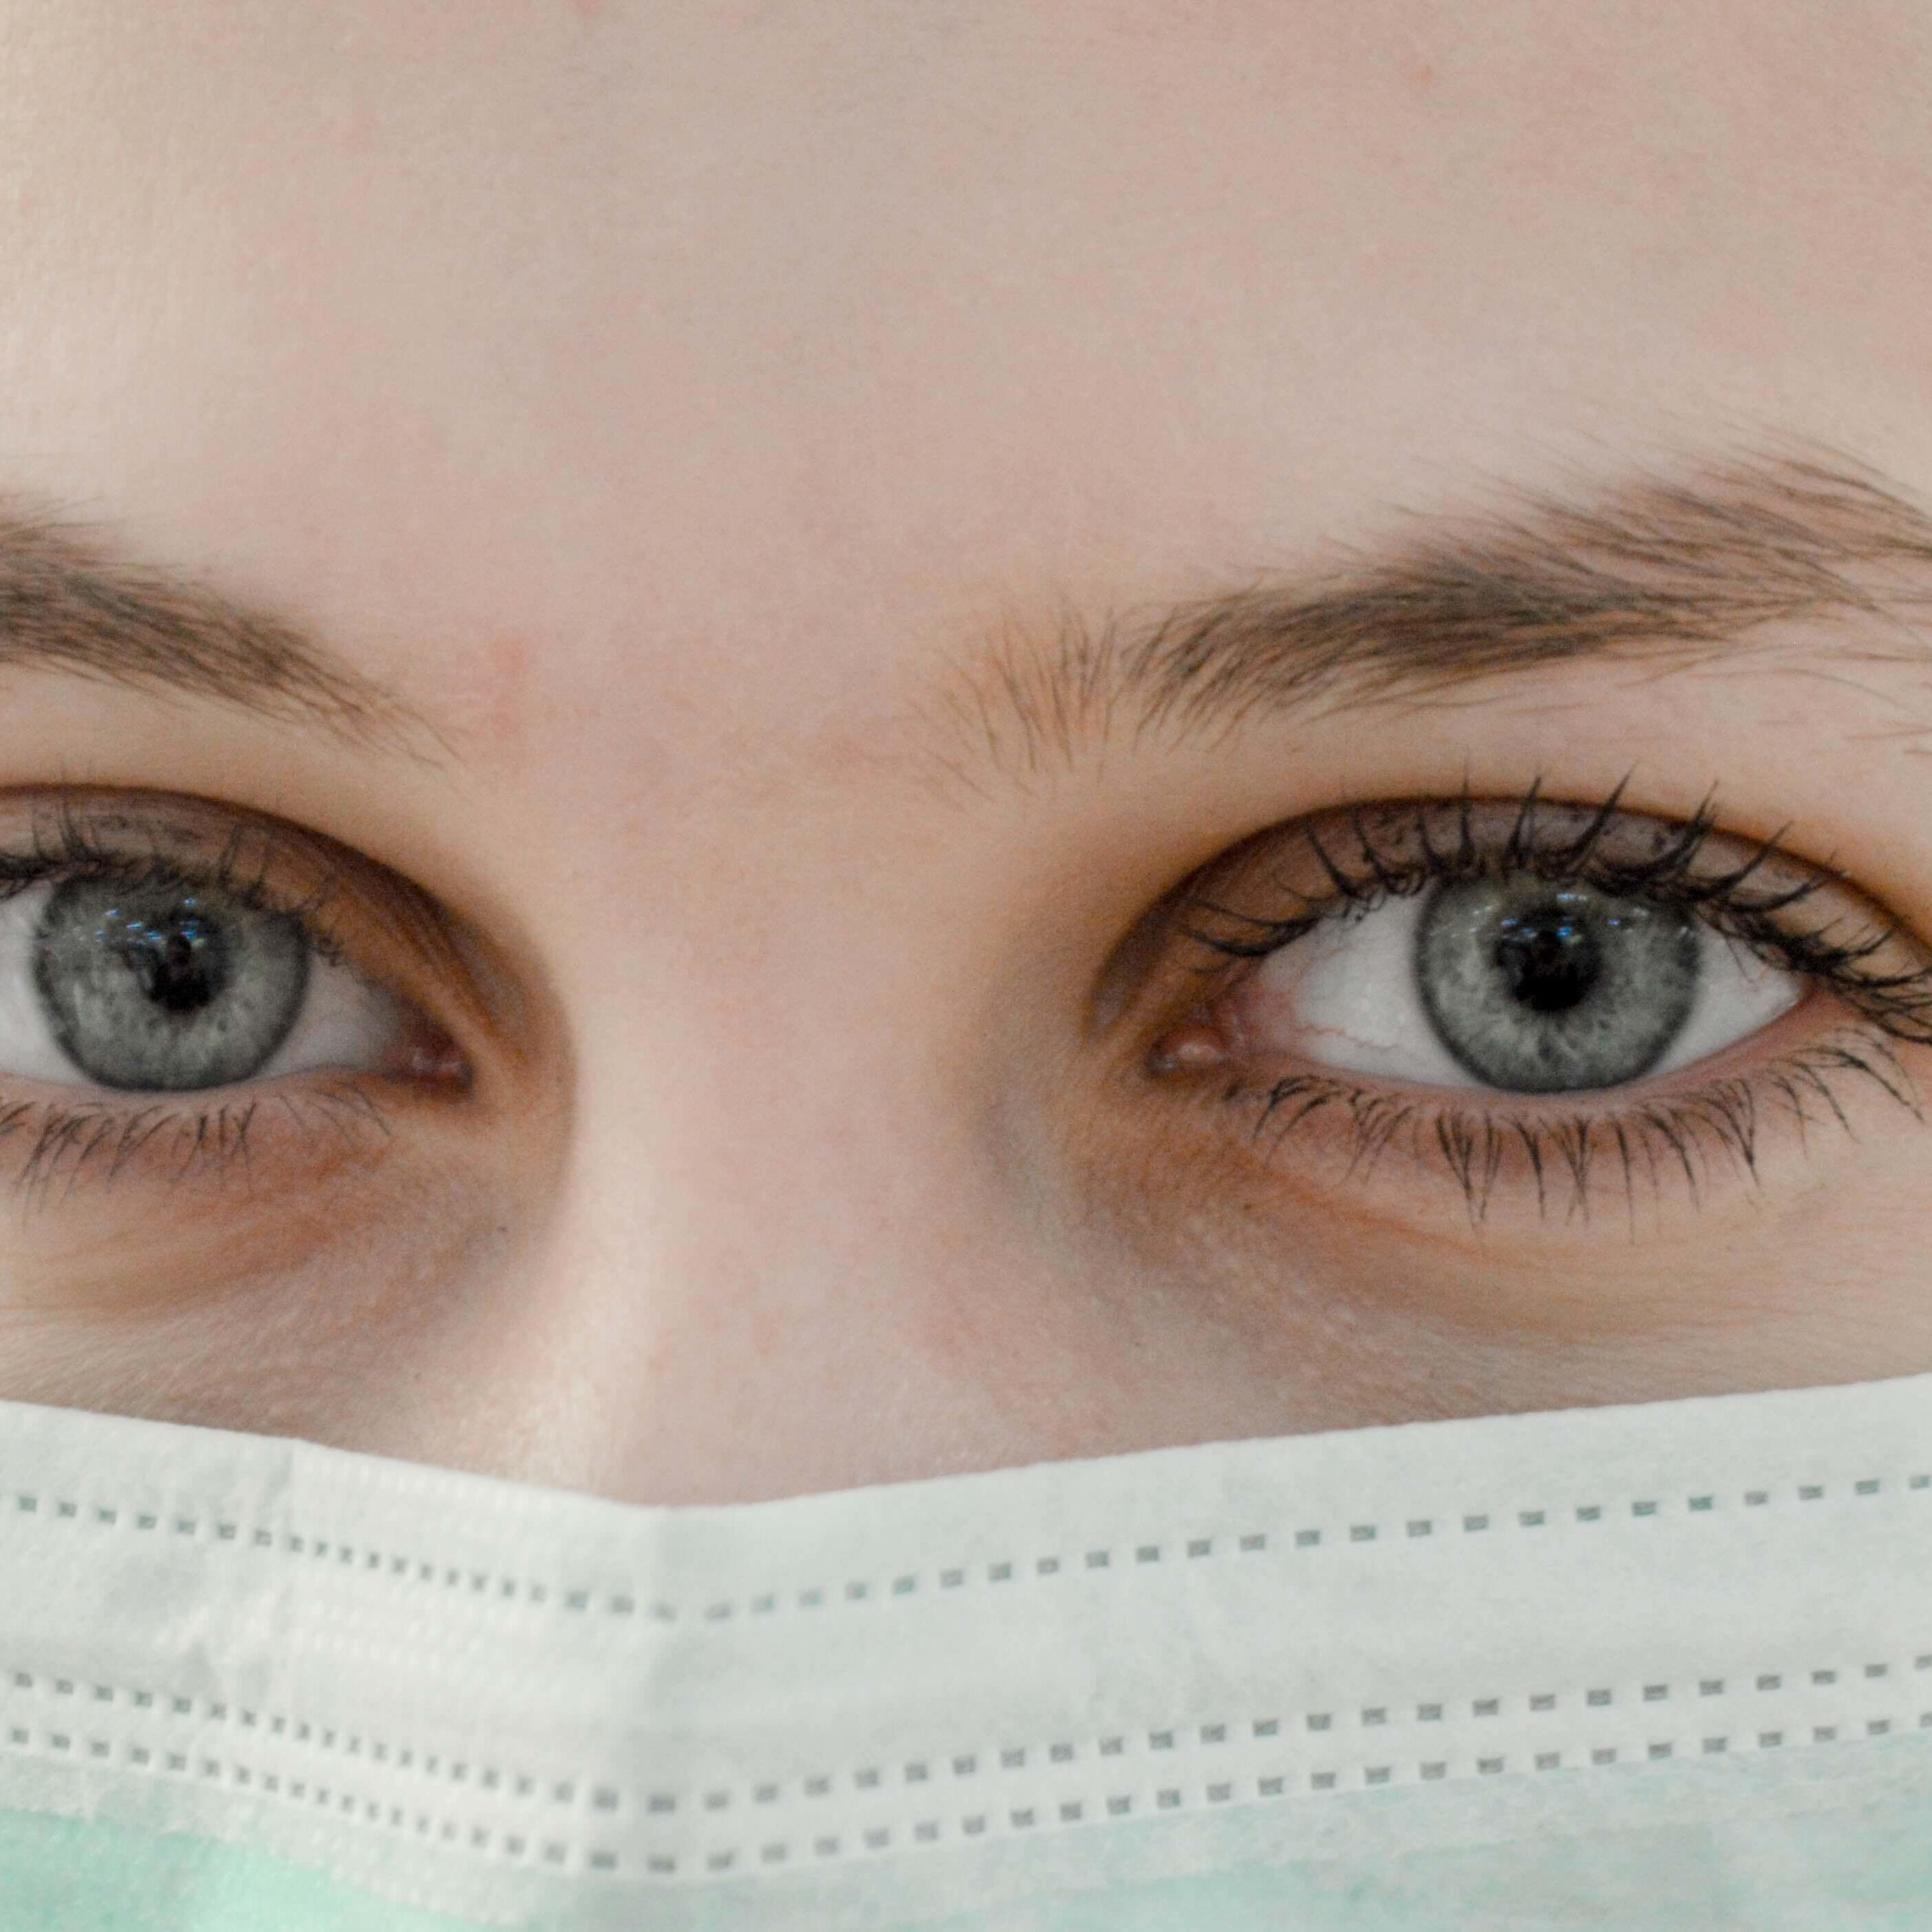 aim health portland coronavirus